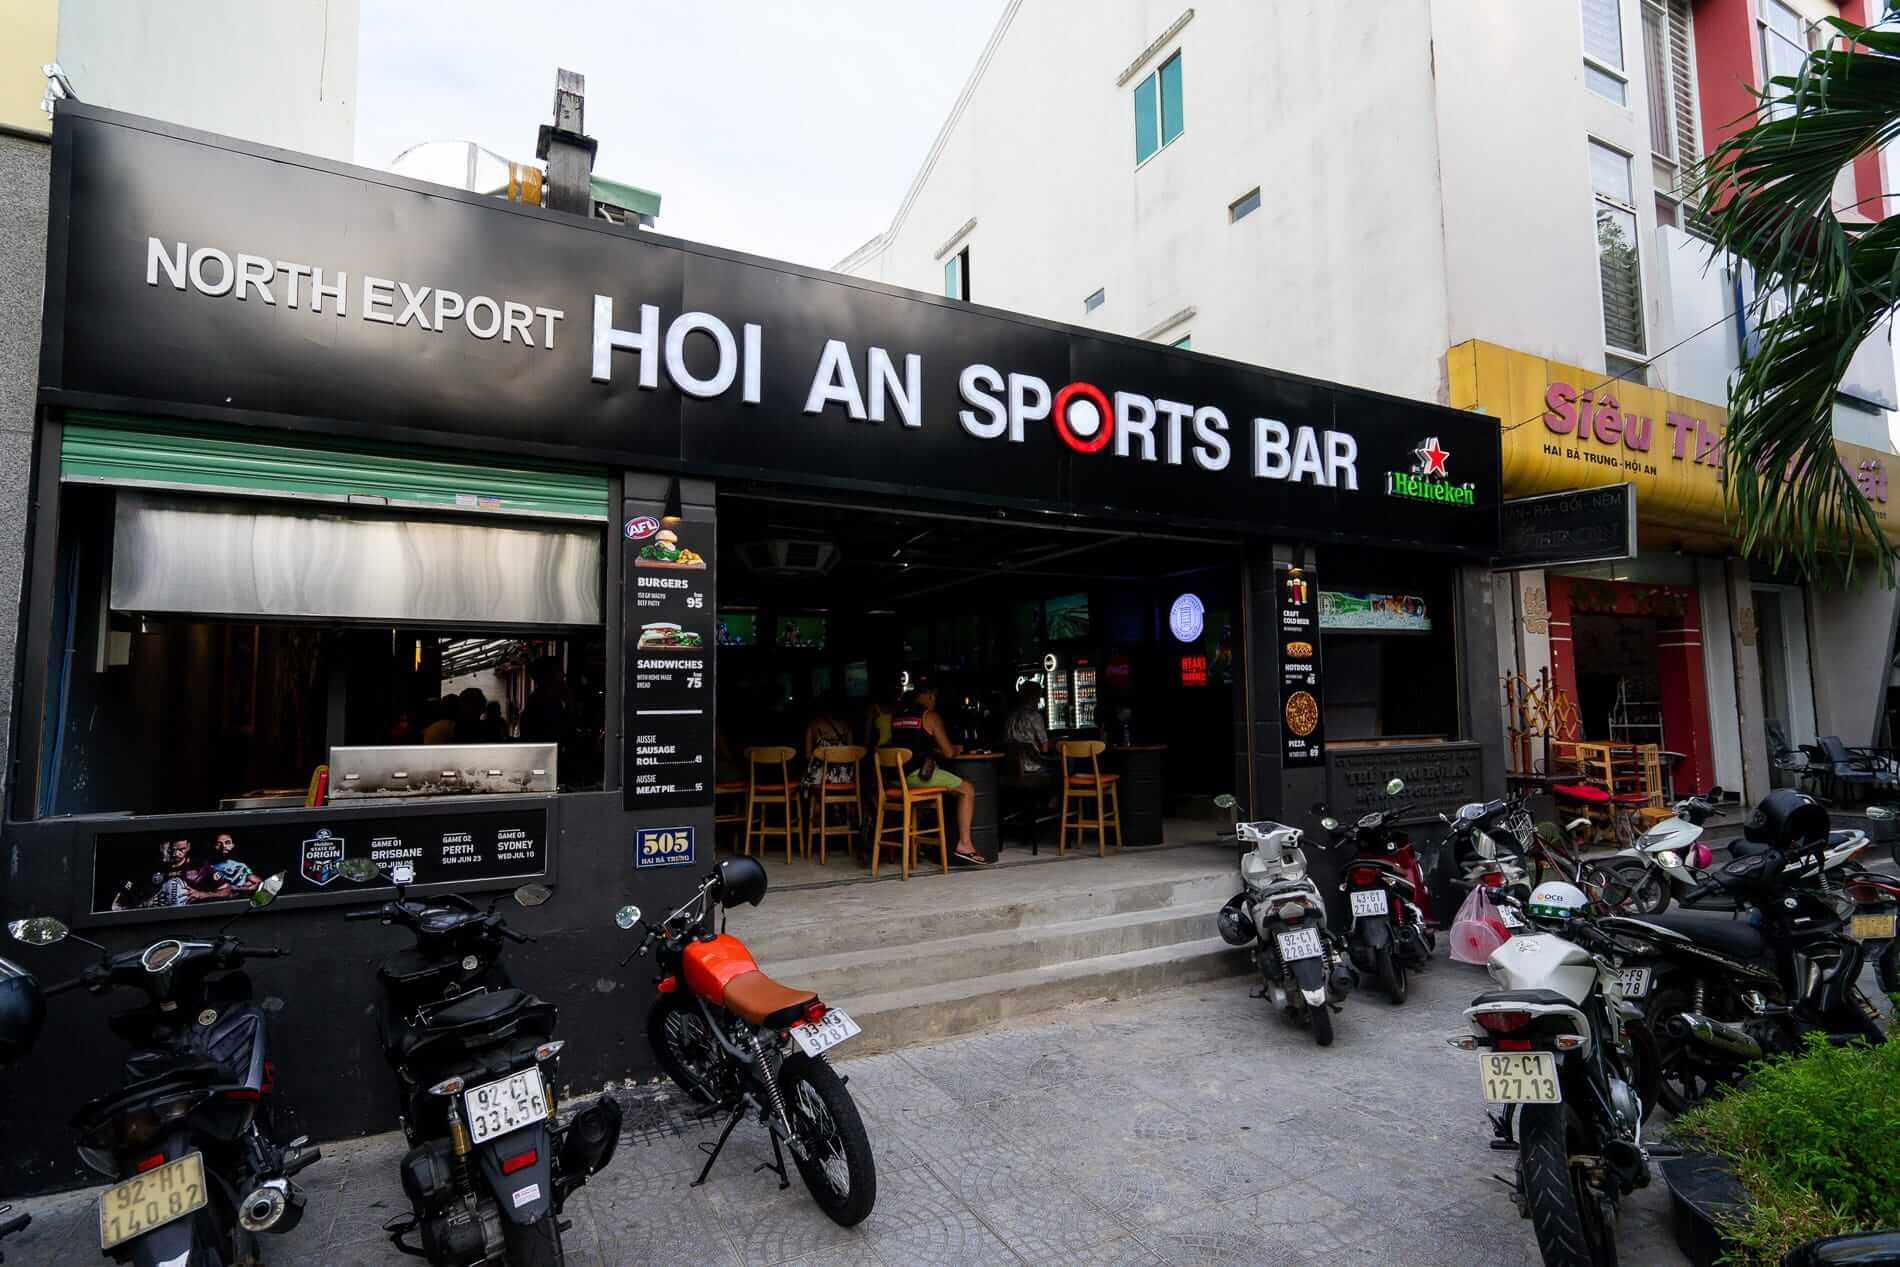 Outside the Hoi An sports Bar